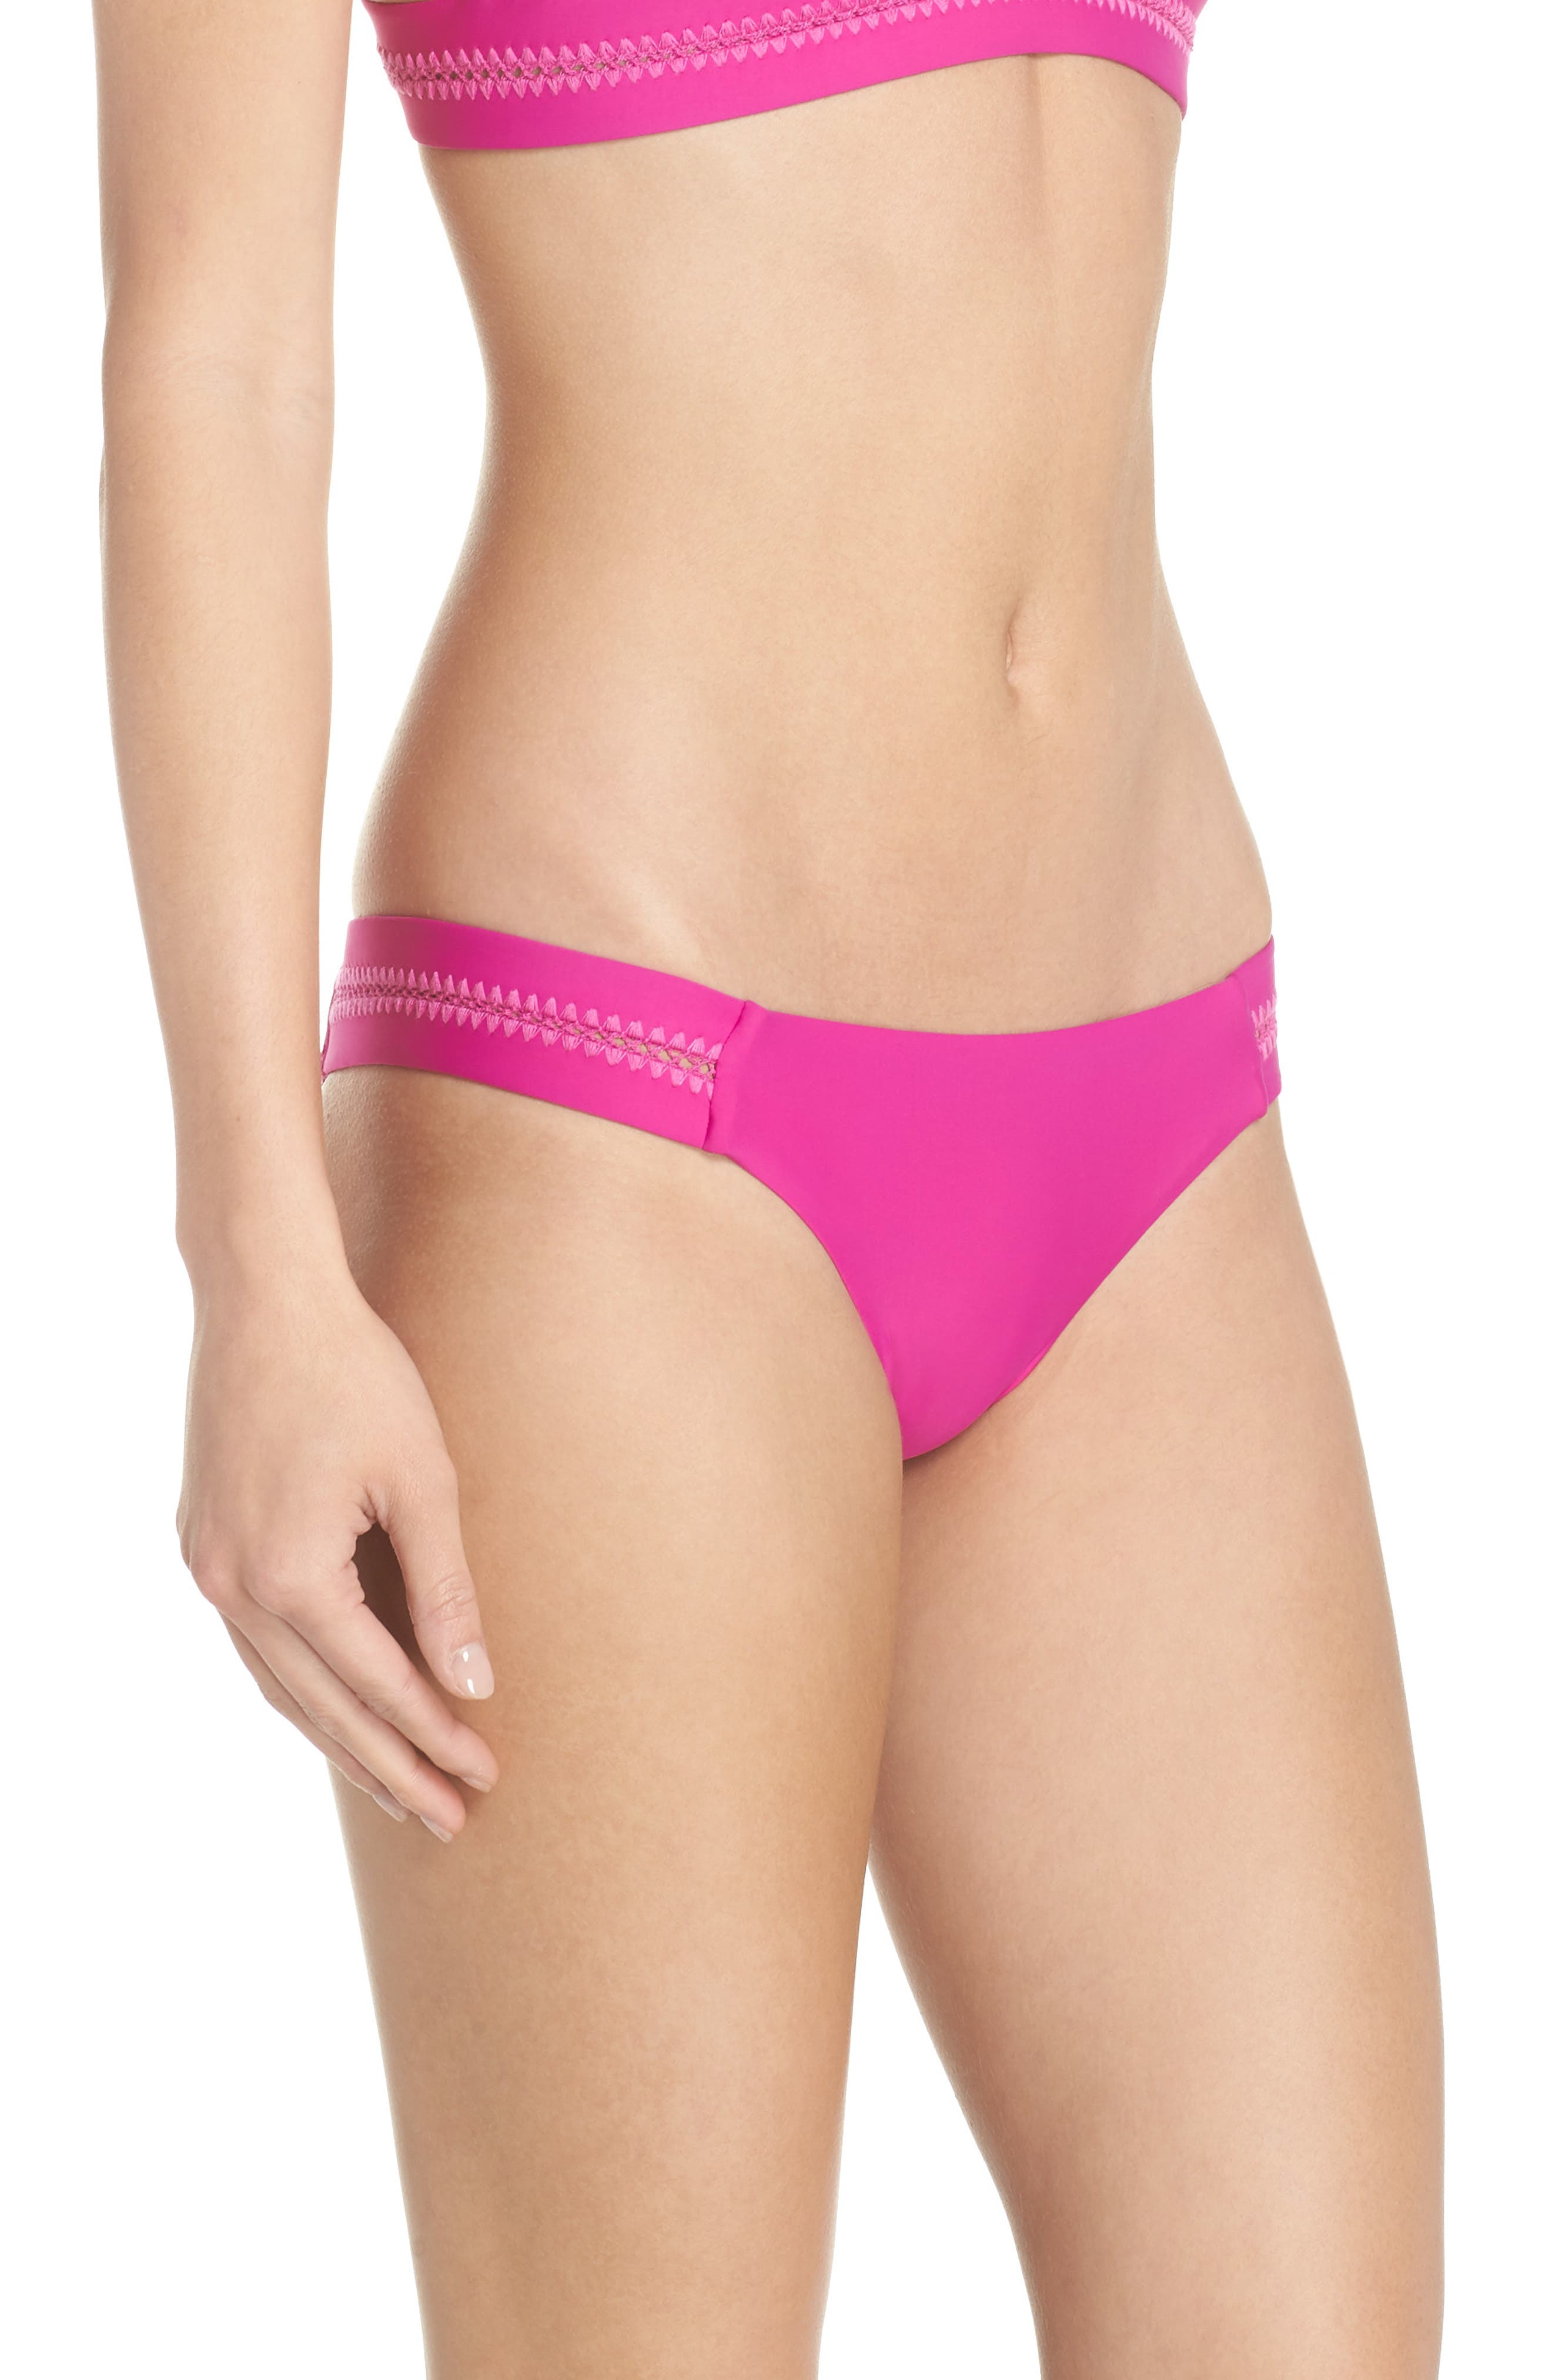 Teeny Stitched Bikini Bottoms,                             Alternate thumbnail 3, color,                             FUCHSIA